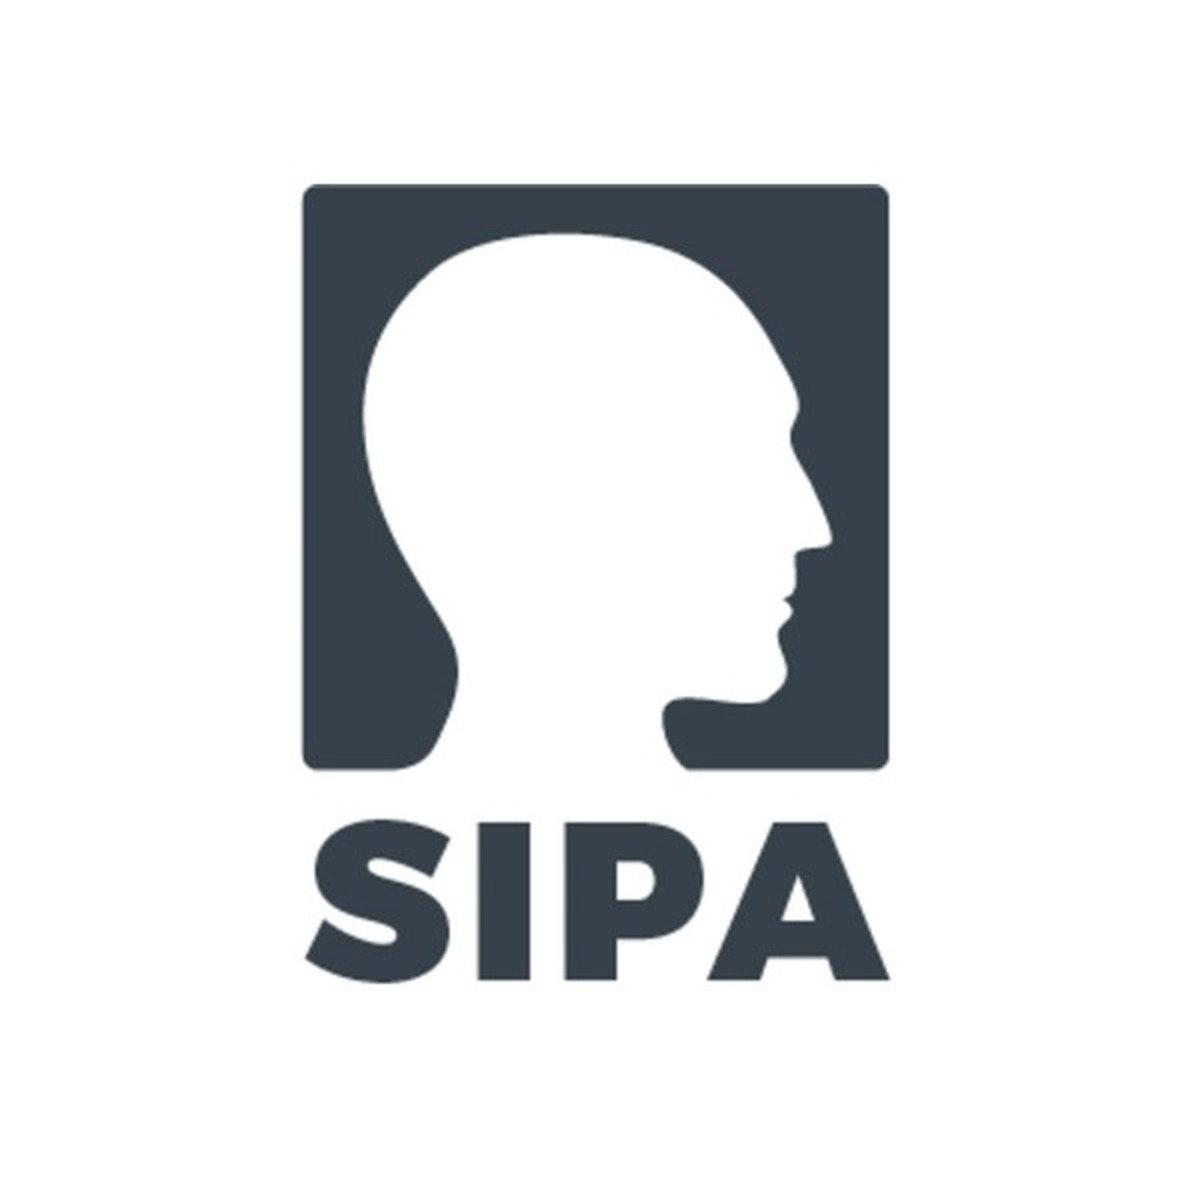 SIPA Unternehmer Beratung GmbH & Co. KG